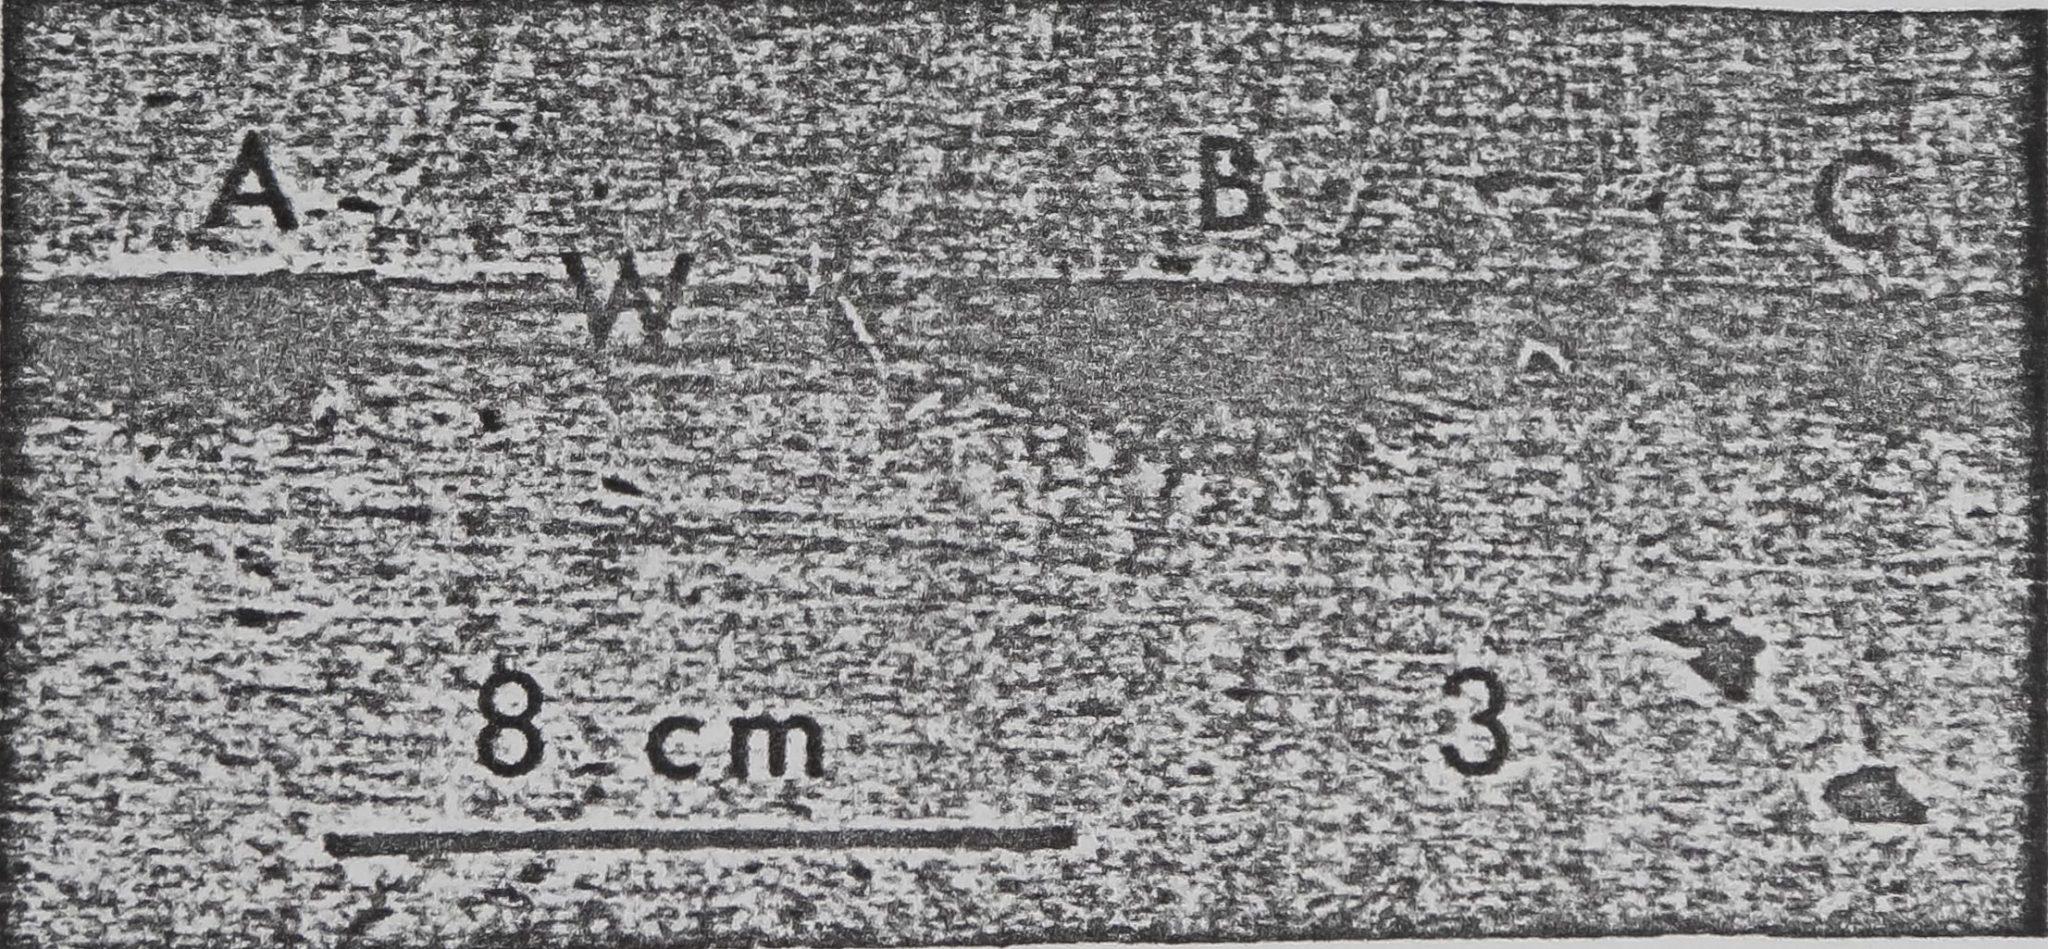 1978-ComparativeStudiesOfDictyna-3